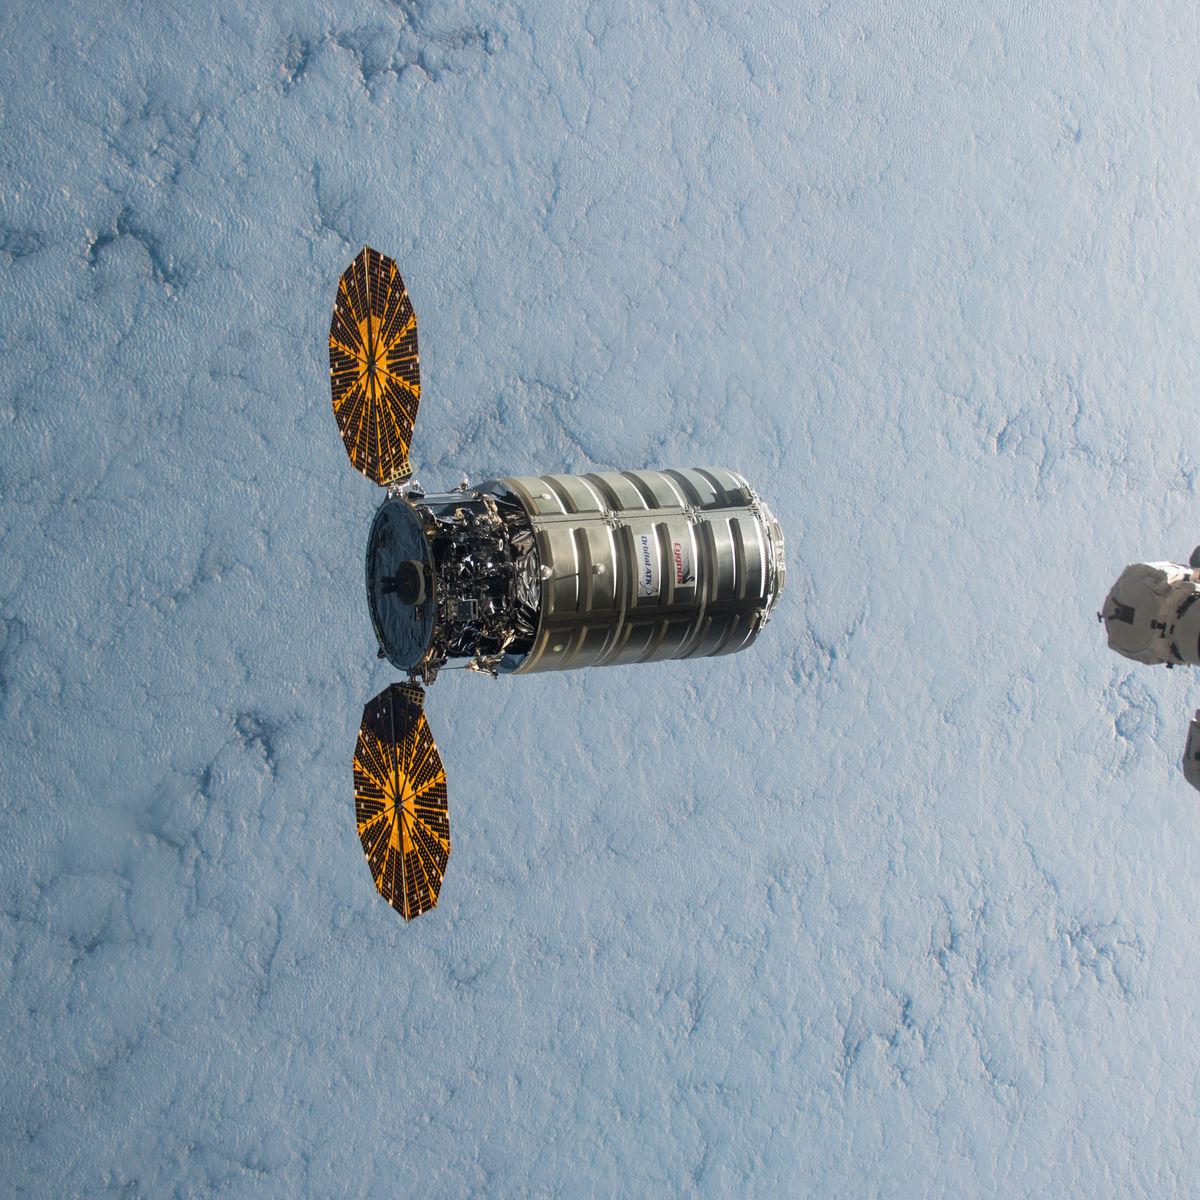 ISS-45_Cygnus_5_approaching_the_ISS_2.jpg